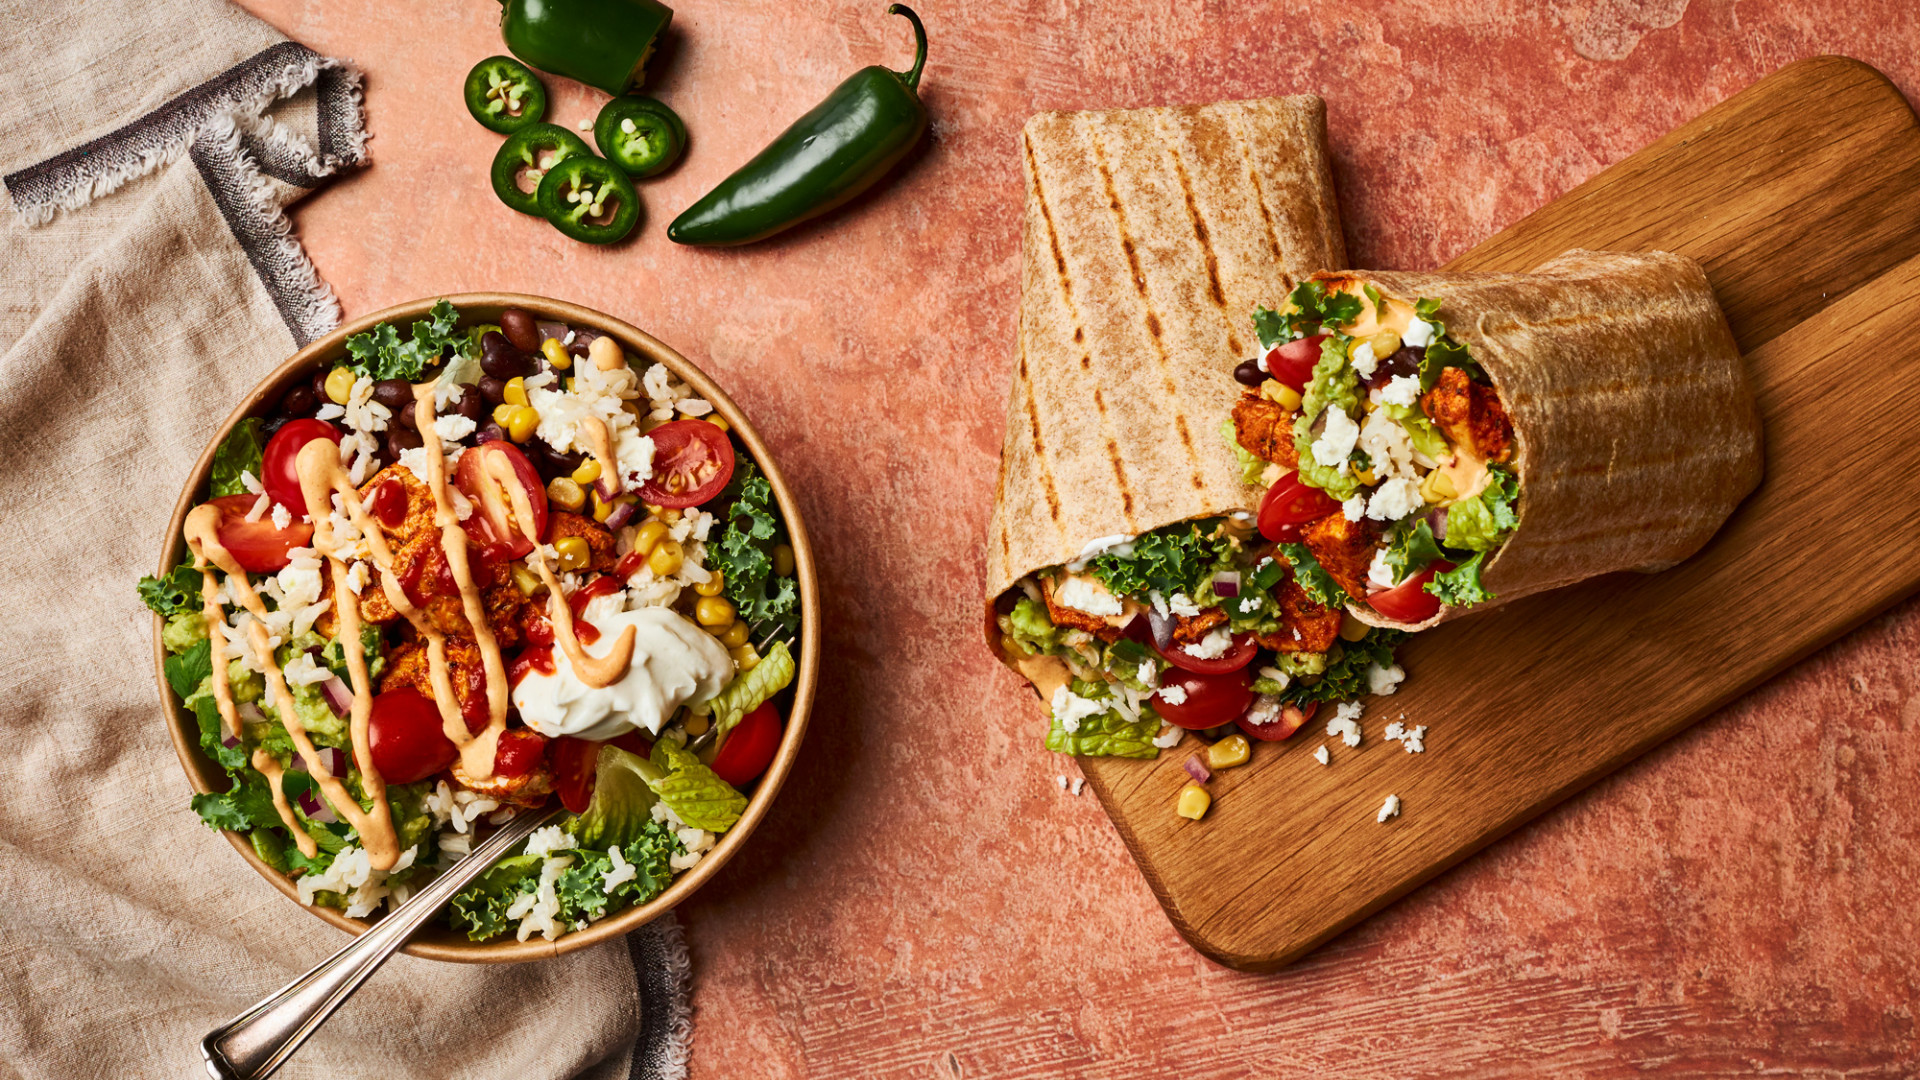 Luisa's Burritos and Bowls